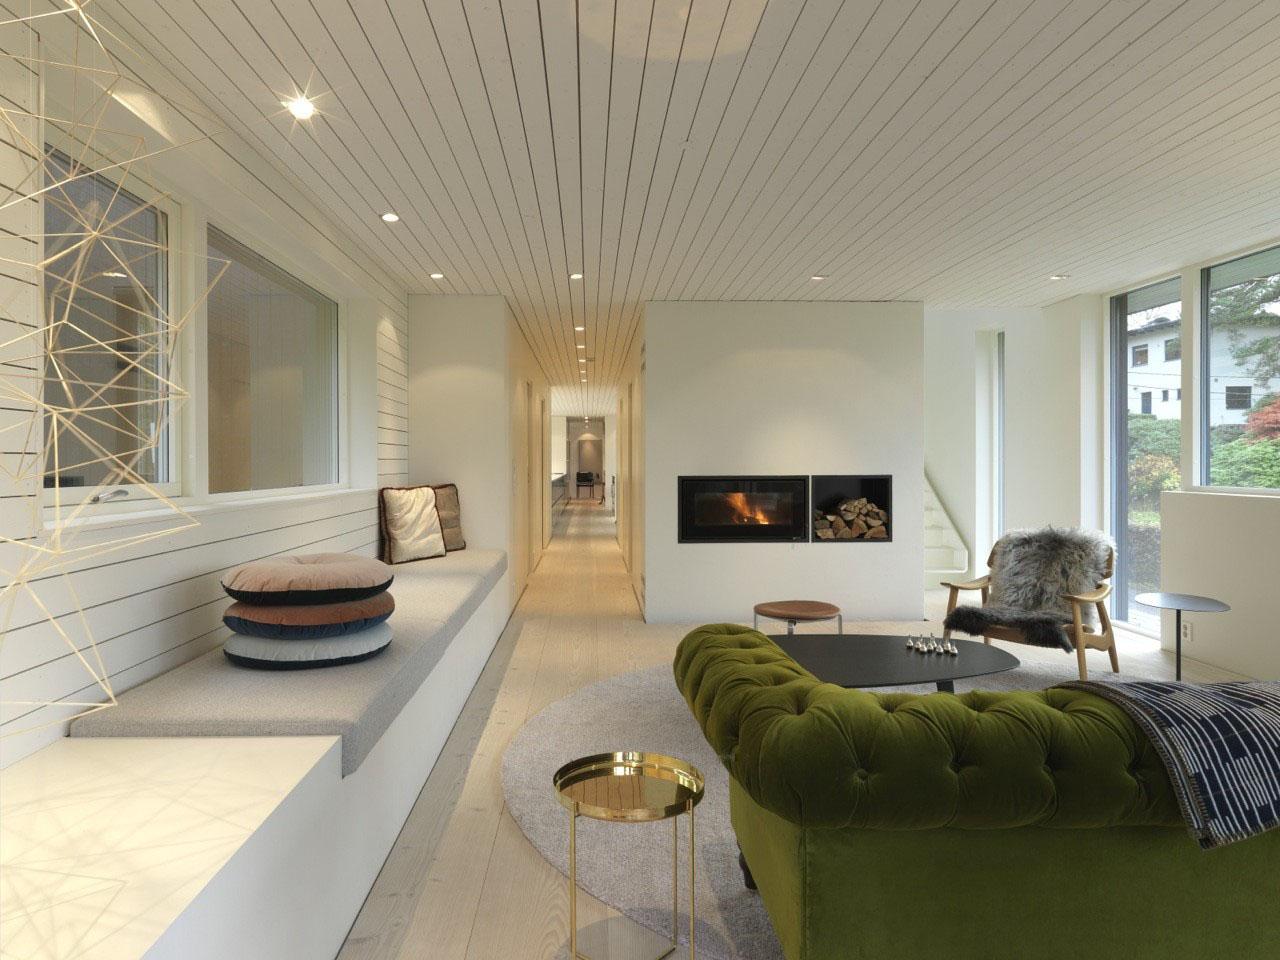 Modern Suburban Villa In Norway IDesignArch Interior